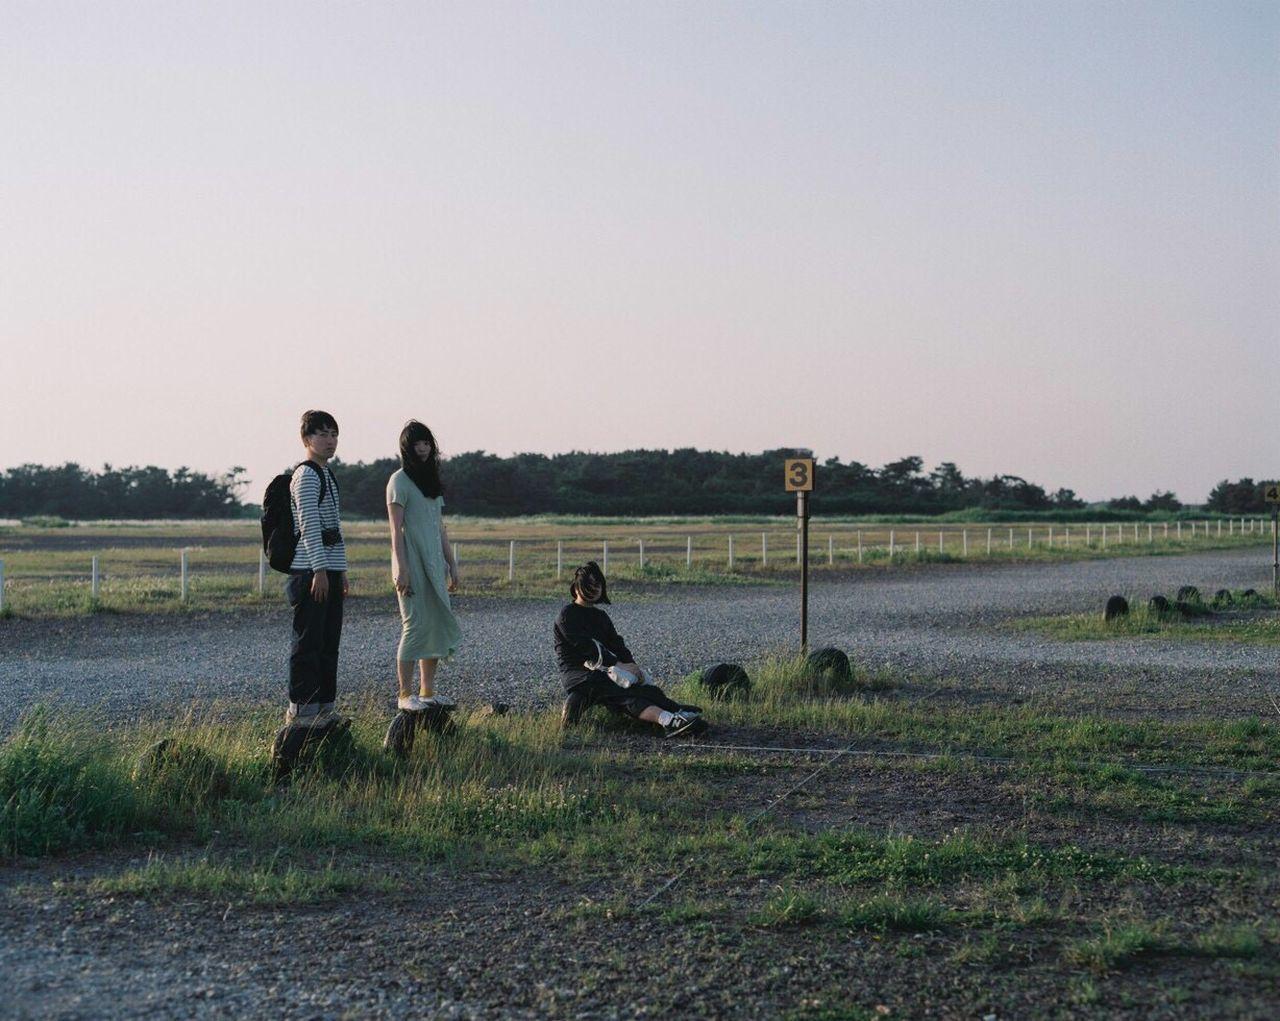 Filmcamera Film Photography Film Filmisnotdead Field